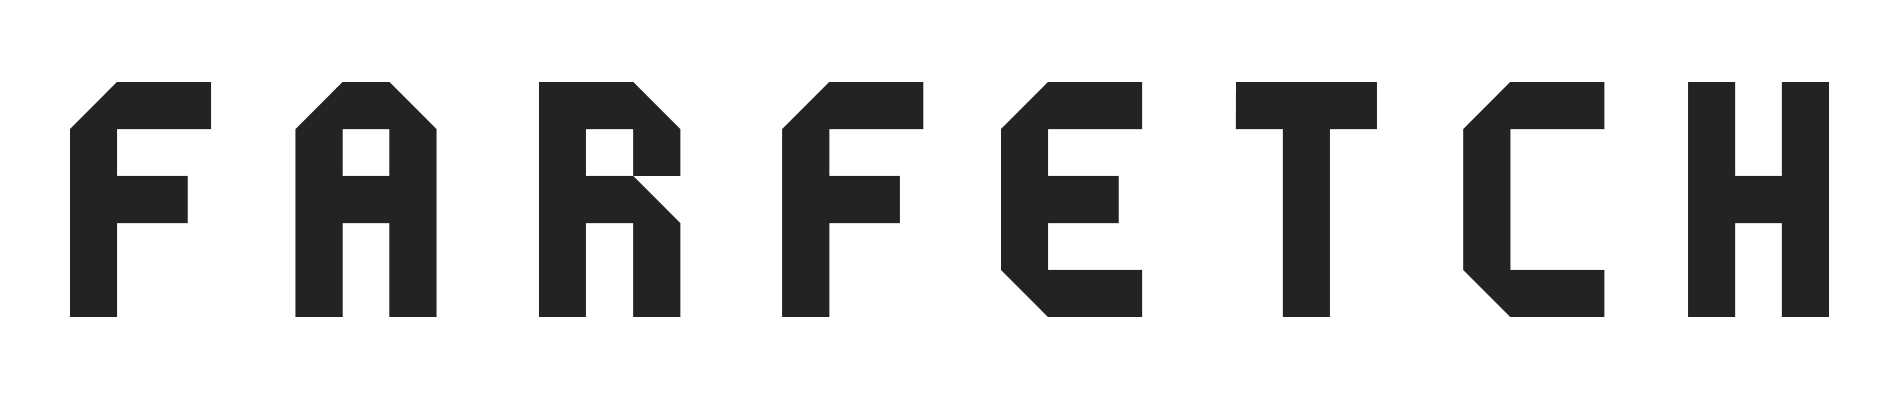 FARFETCH中文网前方高能:清仓折扣低至3折